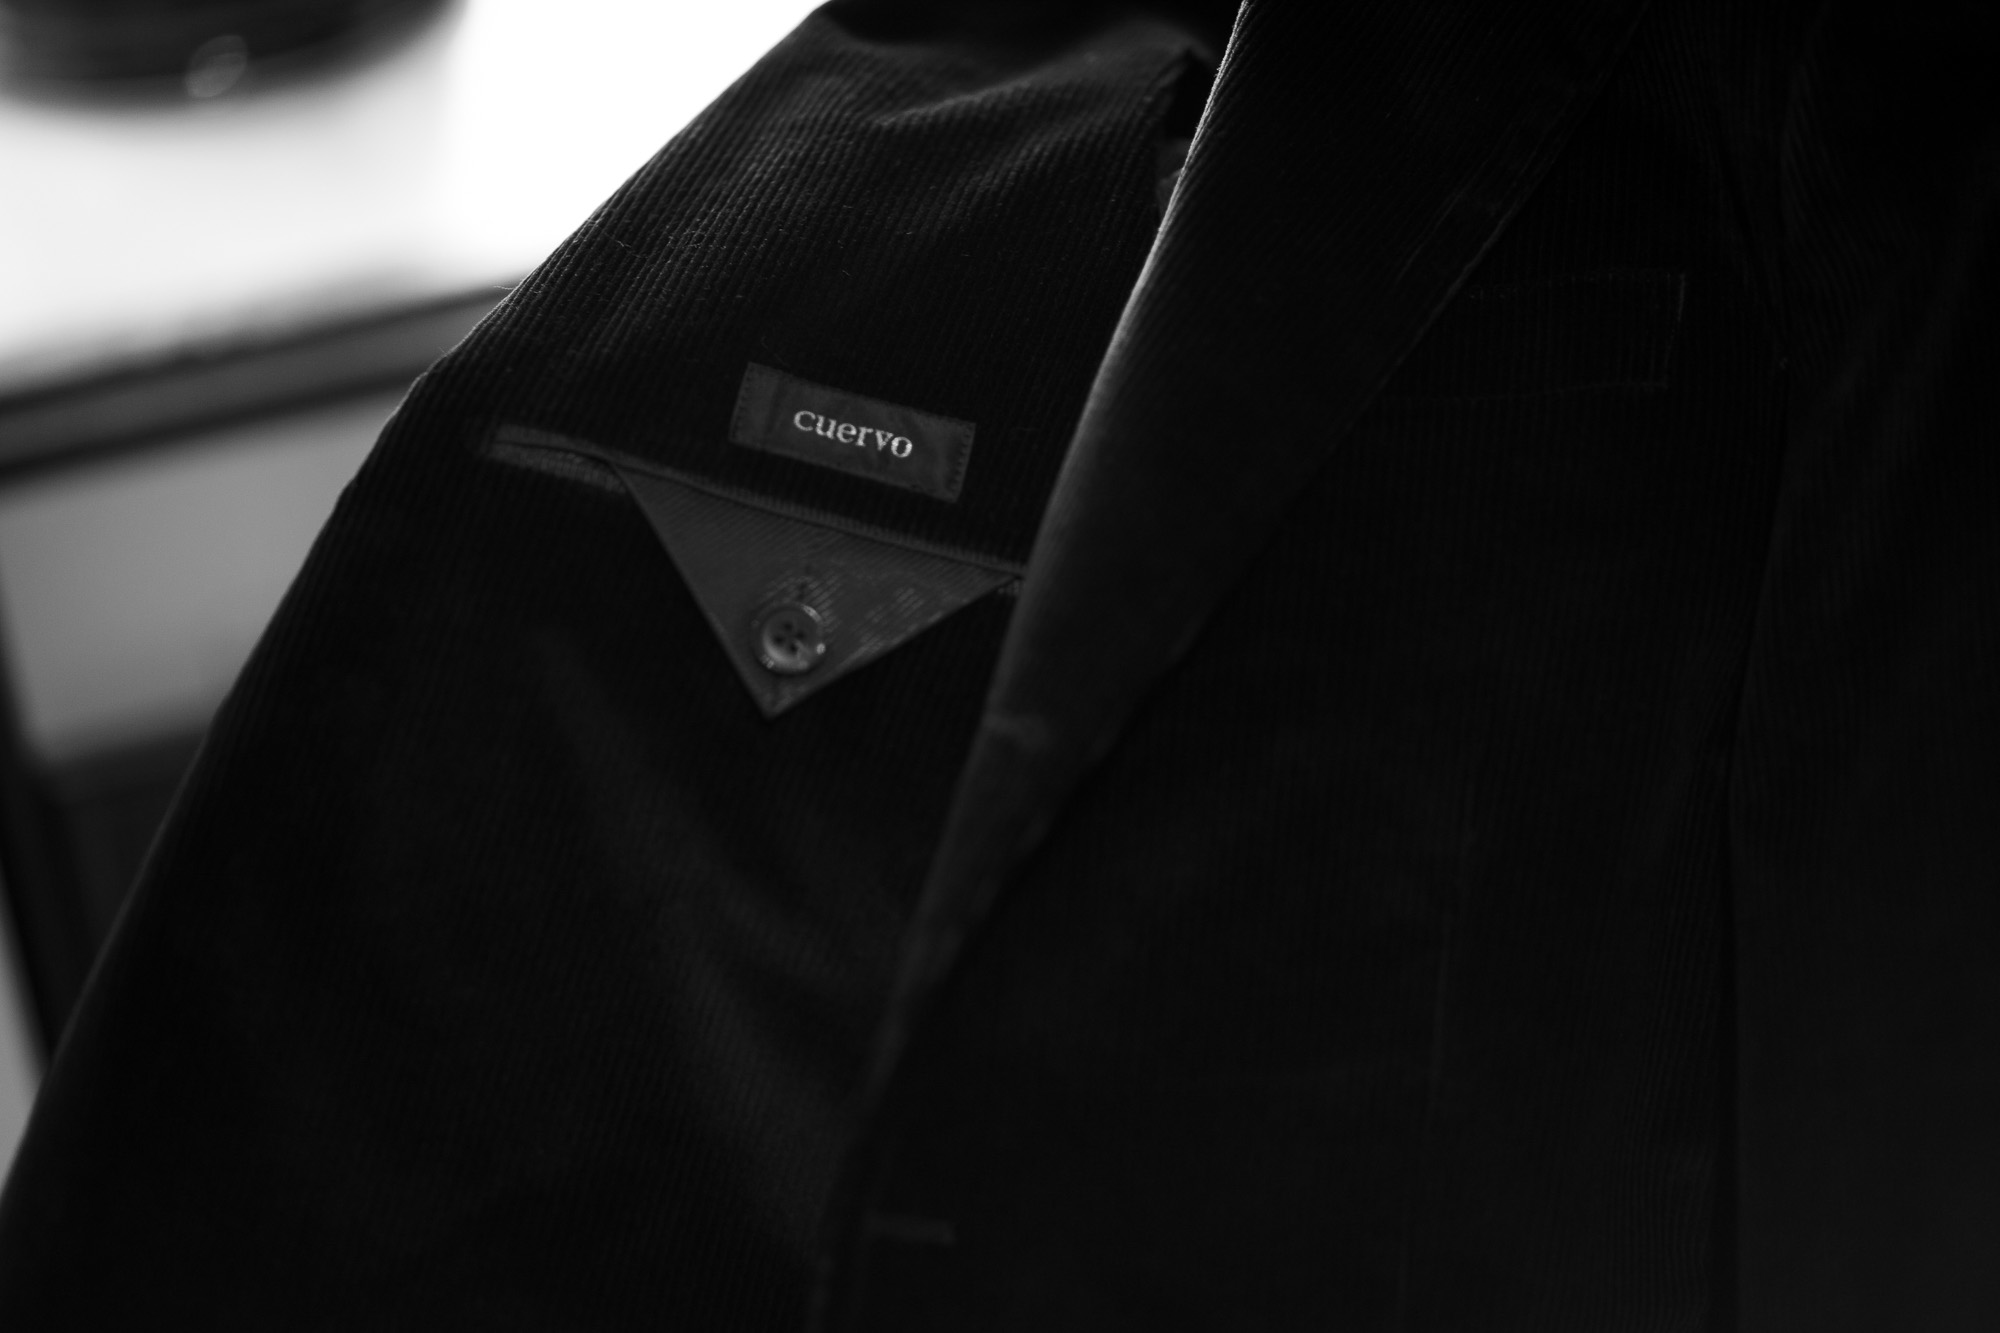 Cuervo (クエルボ) Sartoria Collection (サルトリア コレクション) Rooster (ルースター) STRETCH Corduroy ストレッチコーデュロイ スーツ BLACK (ブラック) MADE IN JAPAN (日本製) 2019 秋冬 【ご予約開始】愛知 名古屋 altoediritto アルトエデリット オーダースーツ オーダー